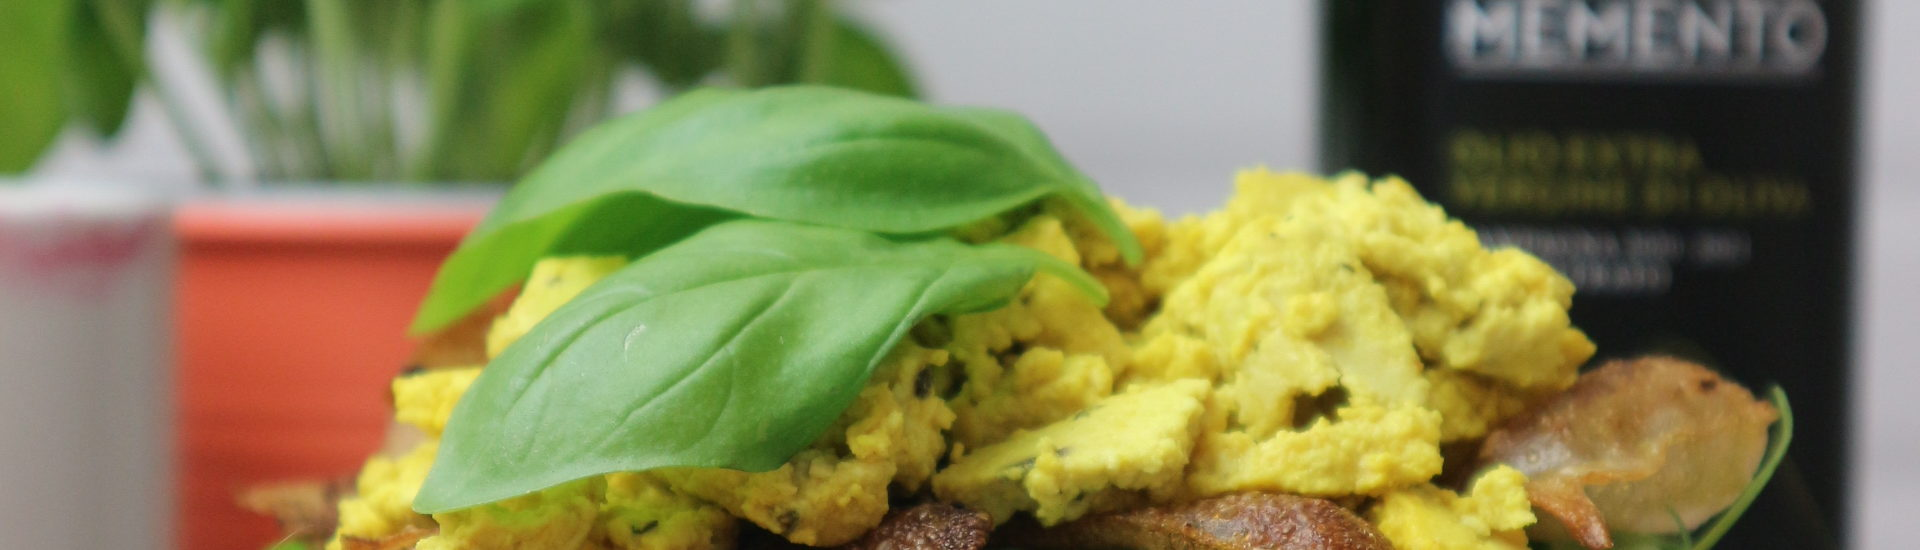 pancake salati vegan senza uova con farina di ceci